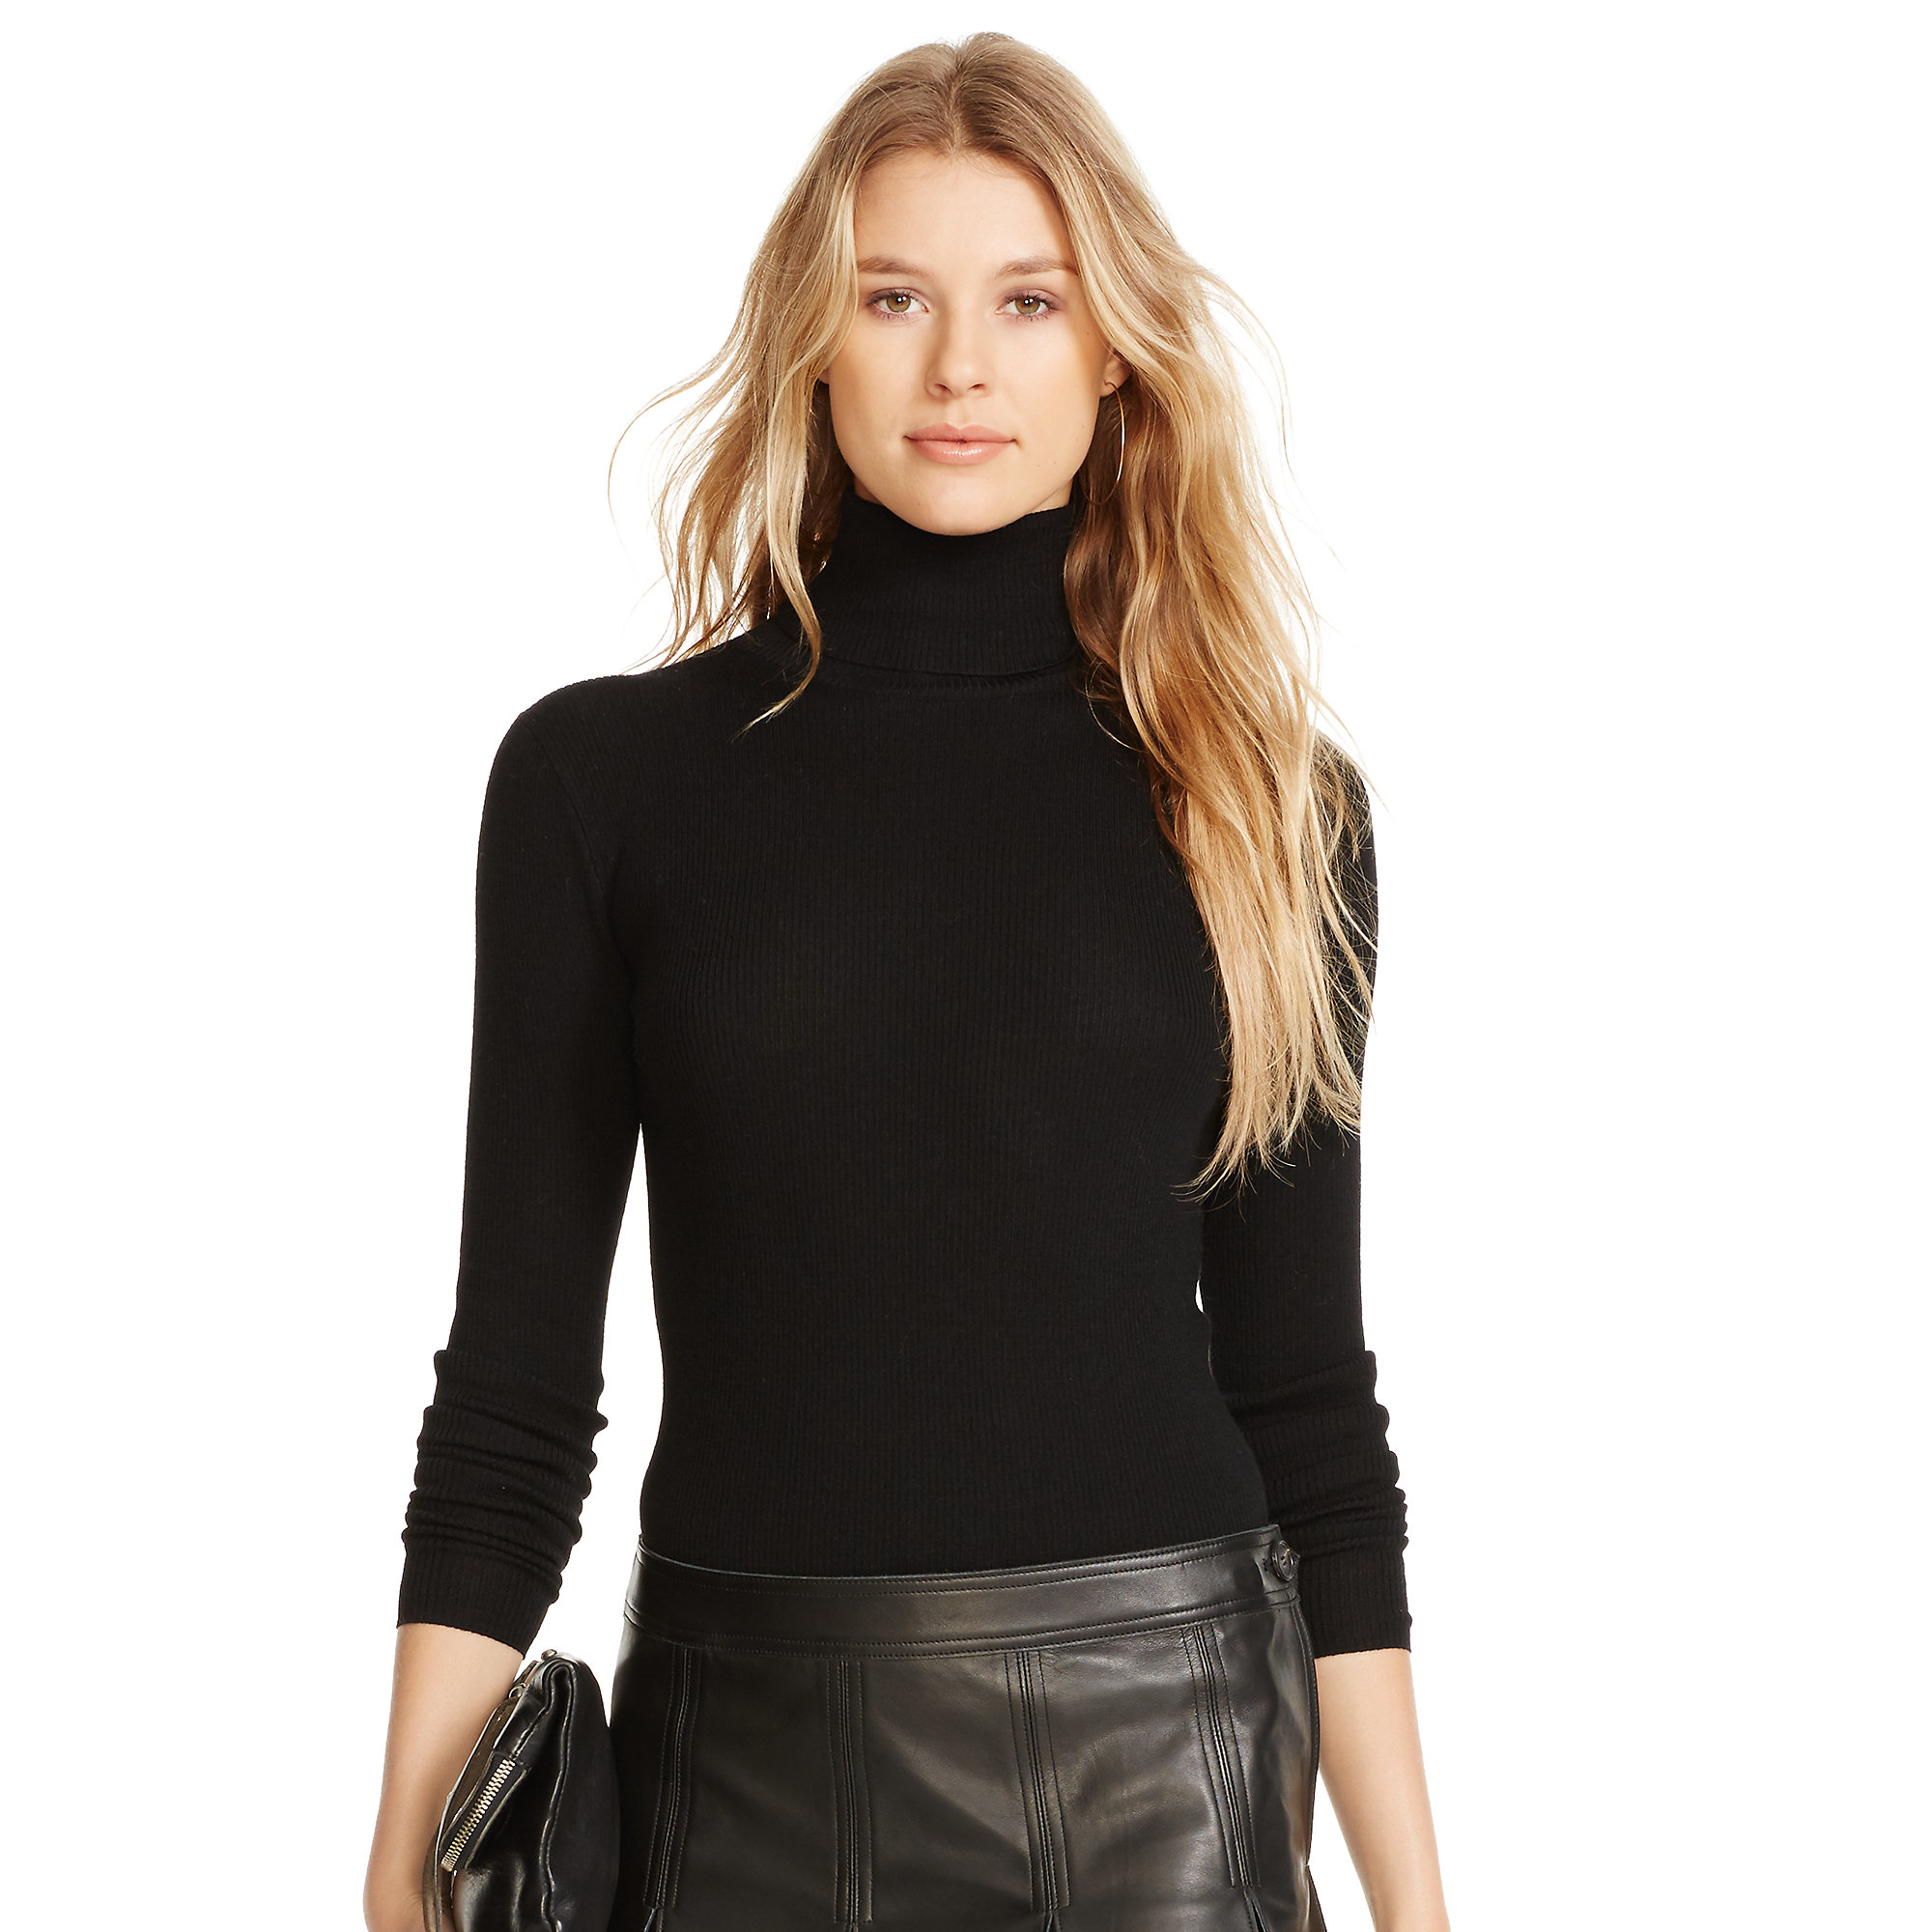 Polo ralph lauren Ribbed Merino Wool Turtleneck in Black | Lyst